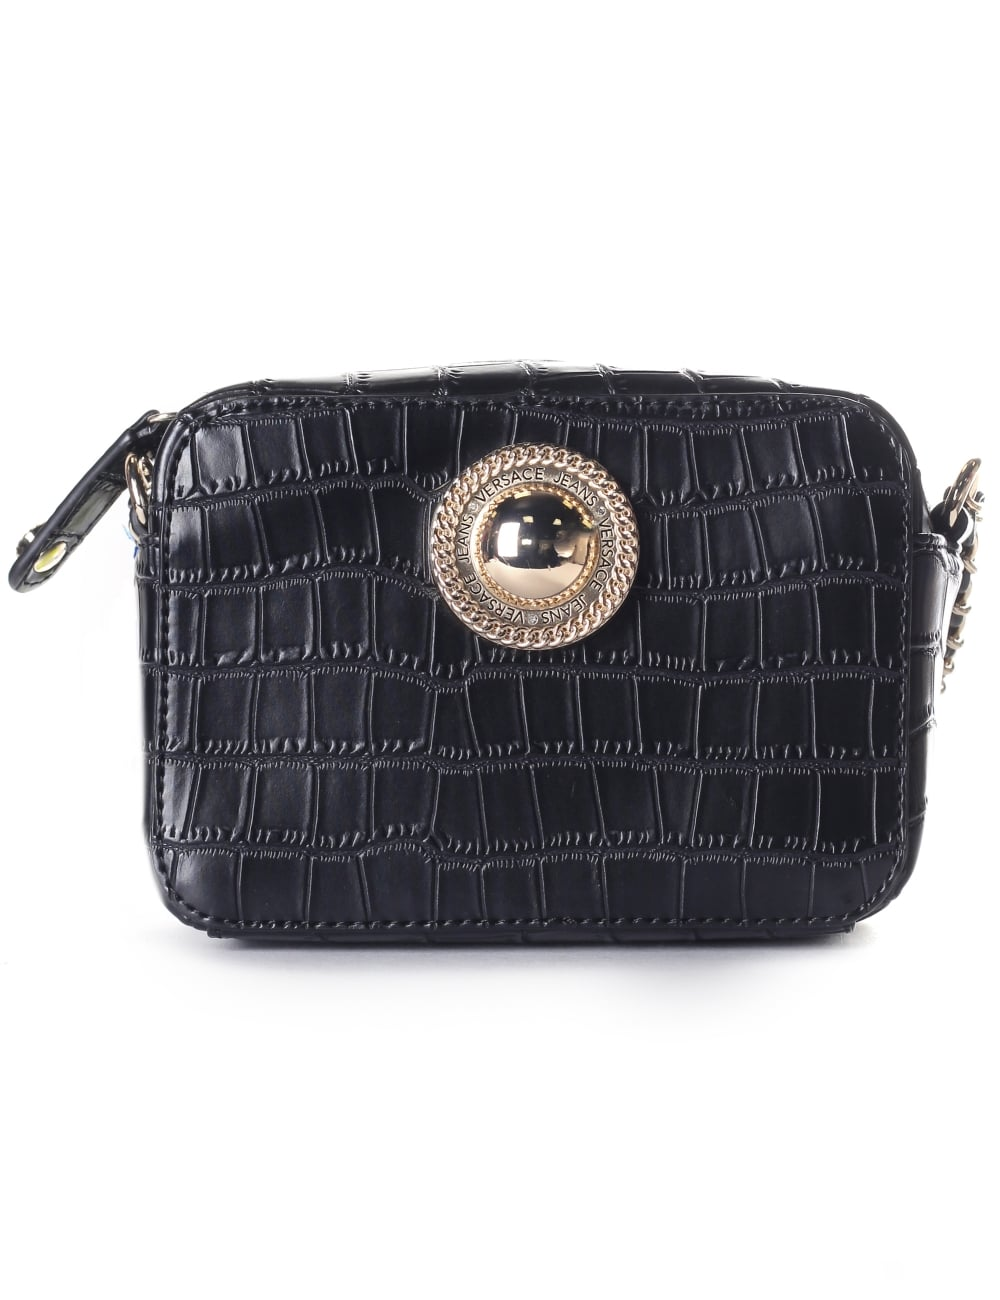 Versace Jeans Croc Print Women s Crossbody Bag 1a75a757193a9